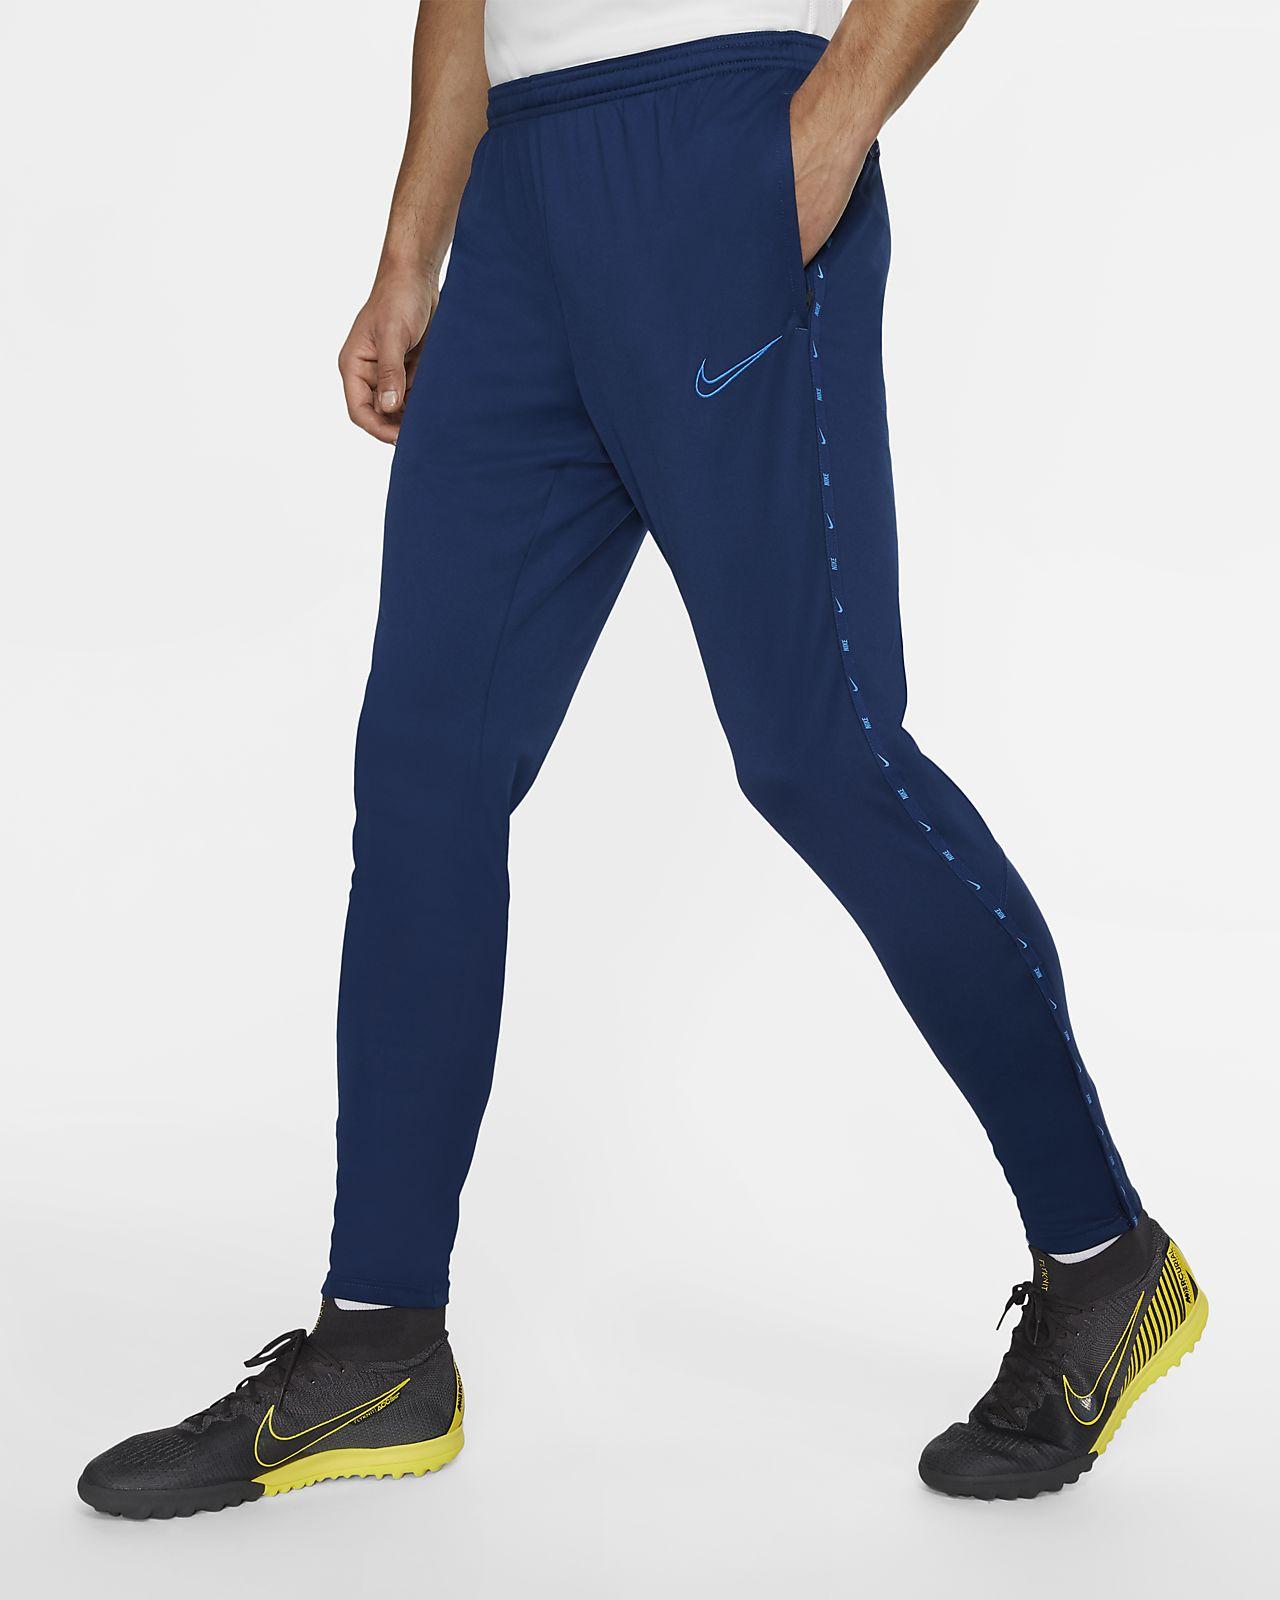 Pantaloni da calcio Nike Dri FIT Academy Uomo